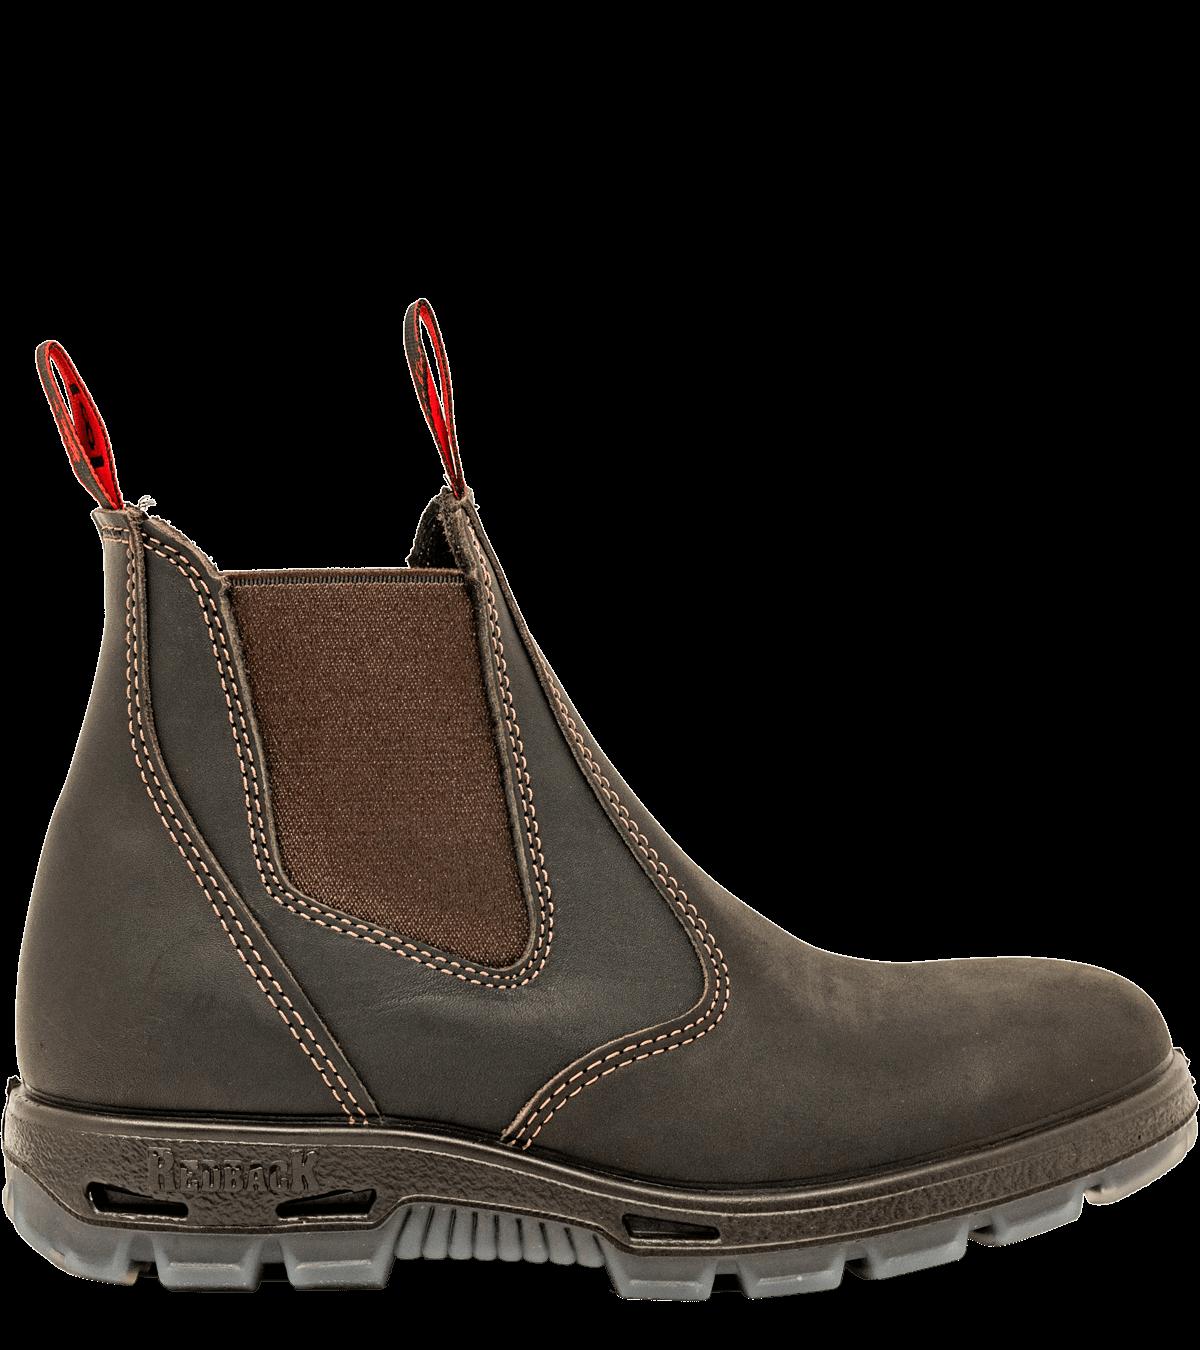 Bonsall | Redback Boots®